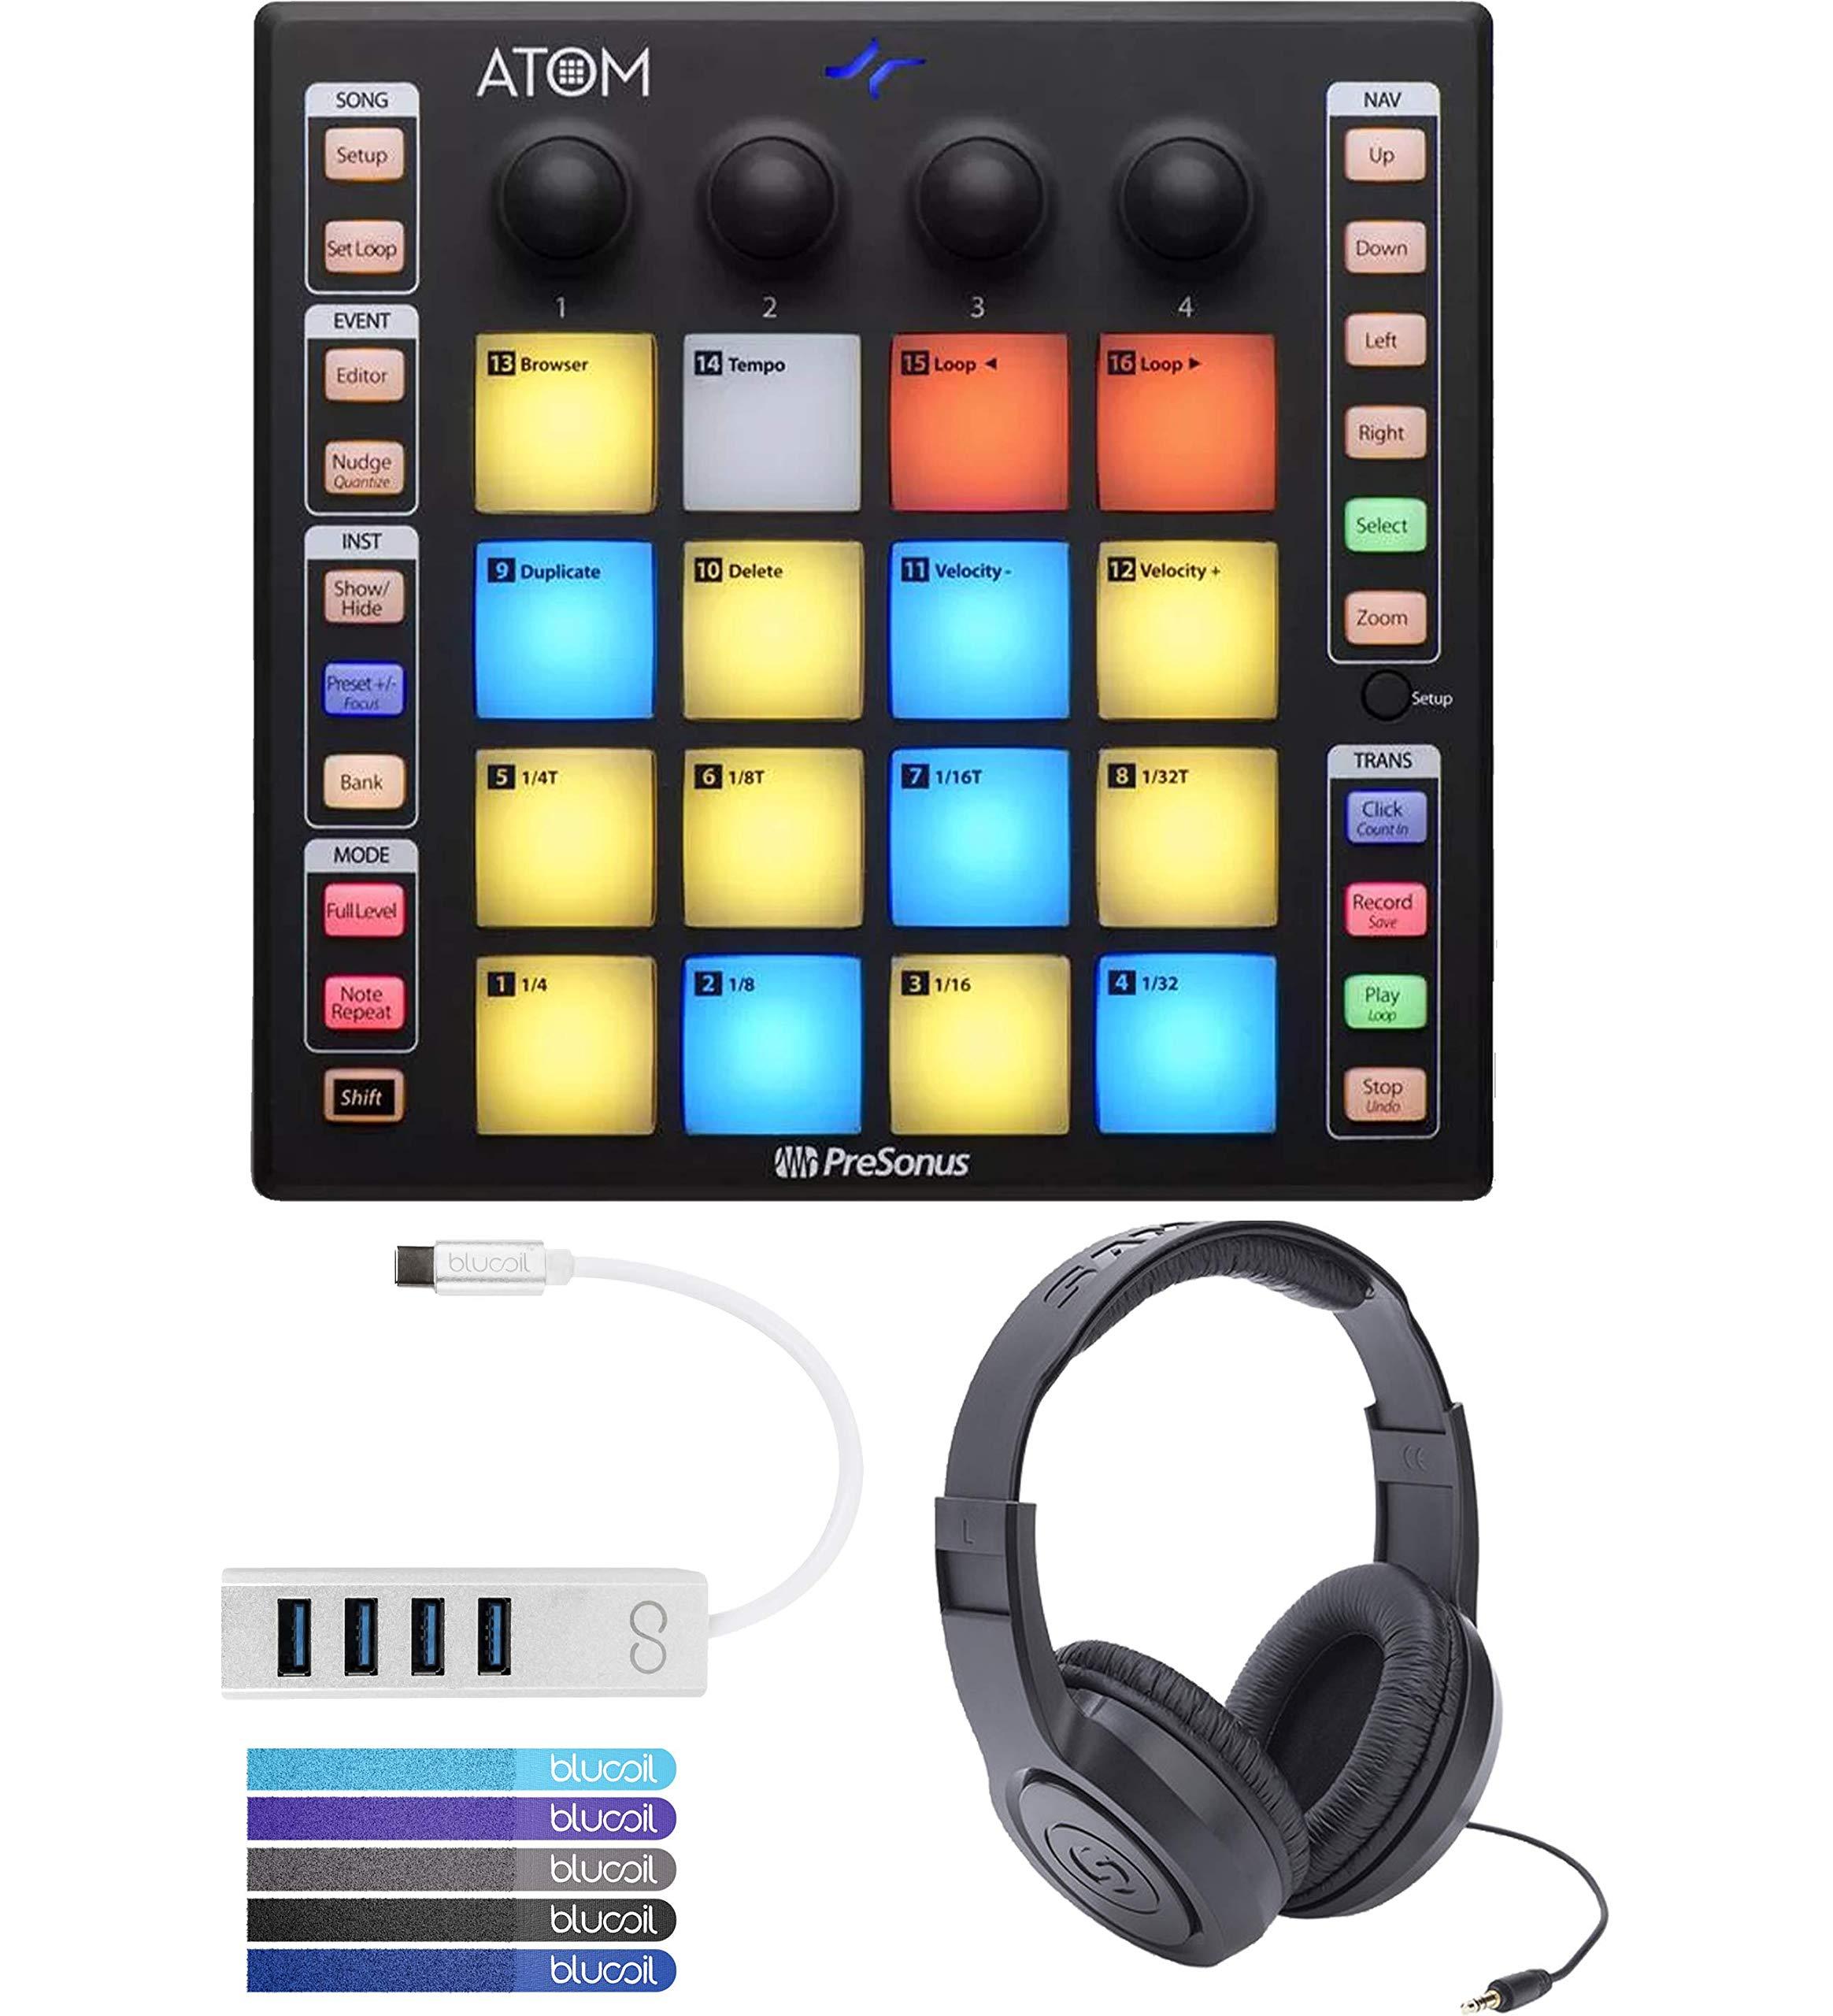 PreSonus ATOM Music Production Controller Bundle with MVP Loops, Studio One Artist Software, Samson SR350 Headphones, Blucoil Mini USB Type-C Hub with 4 USB Ports, and 5x Cable Ties